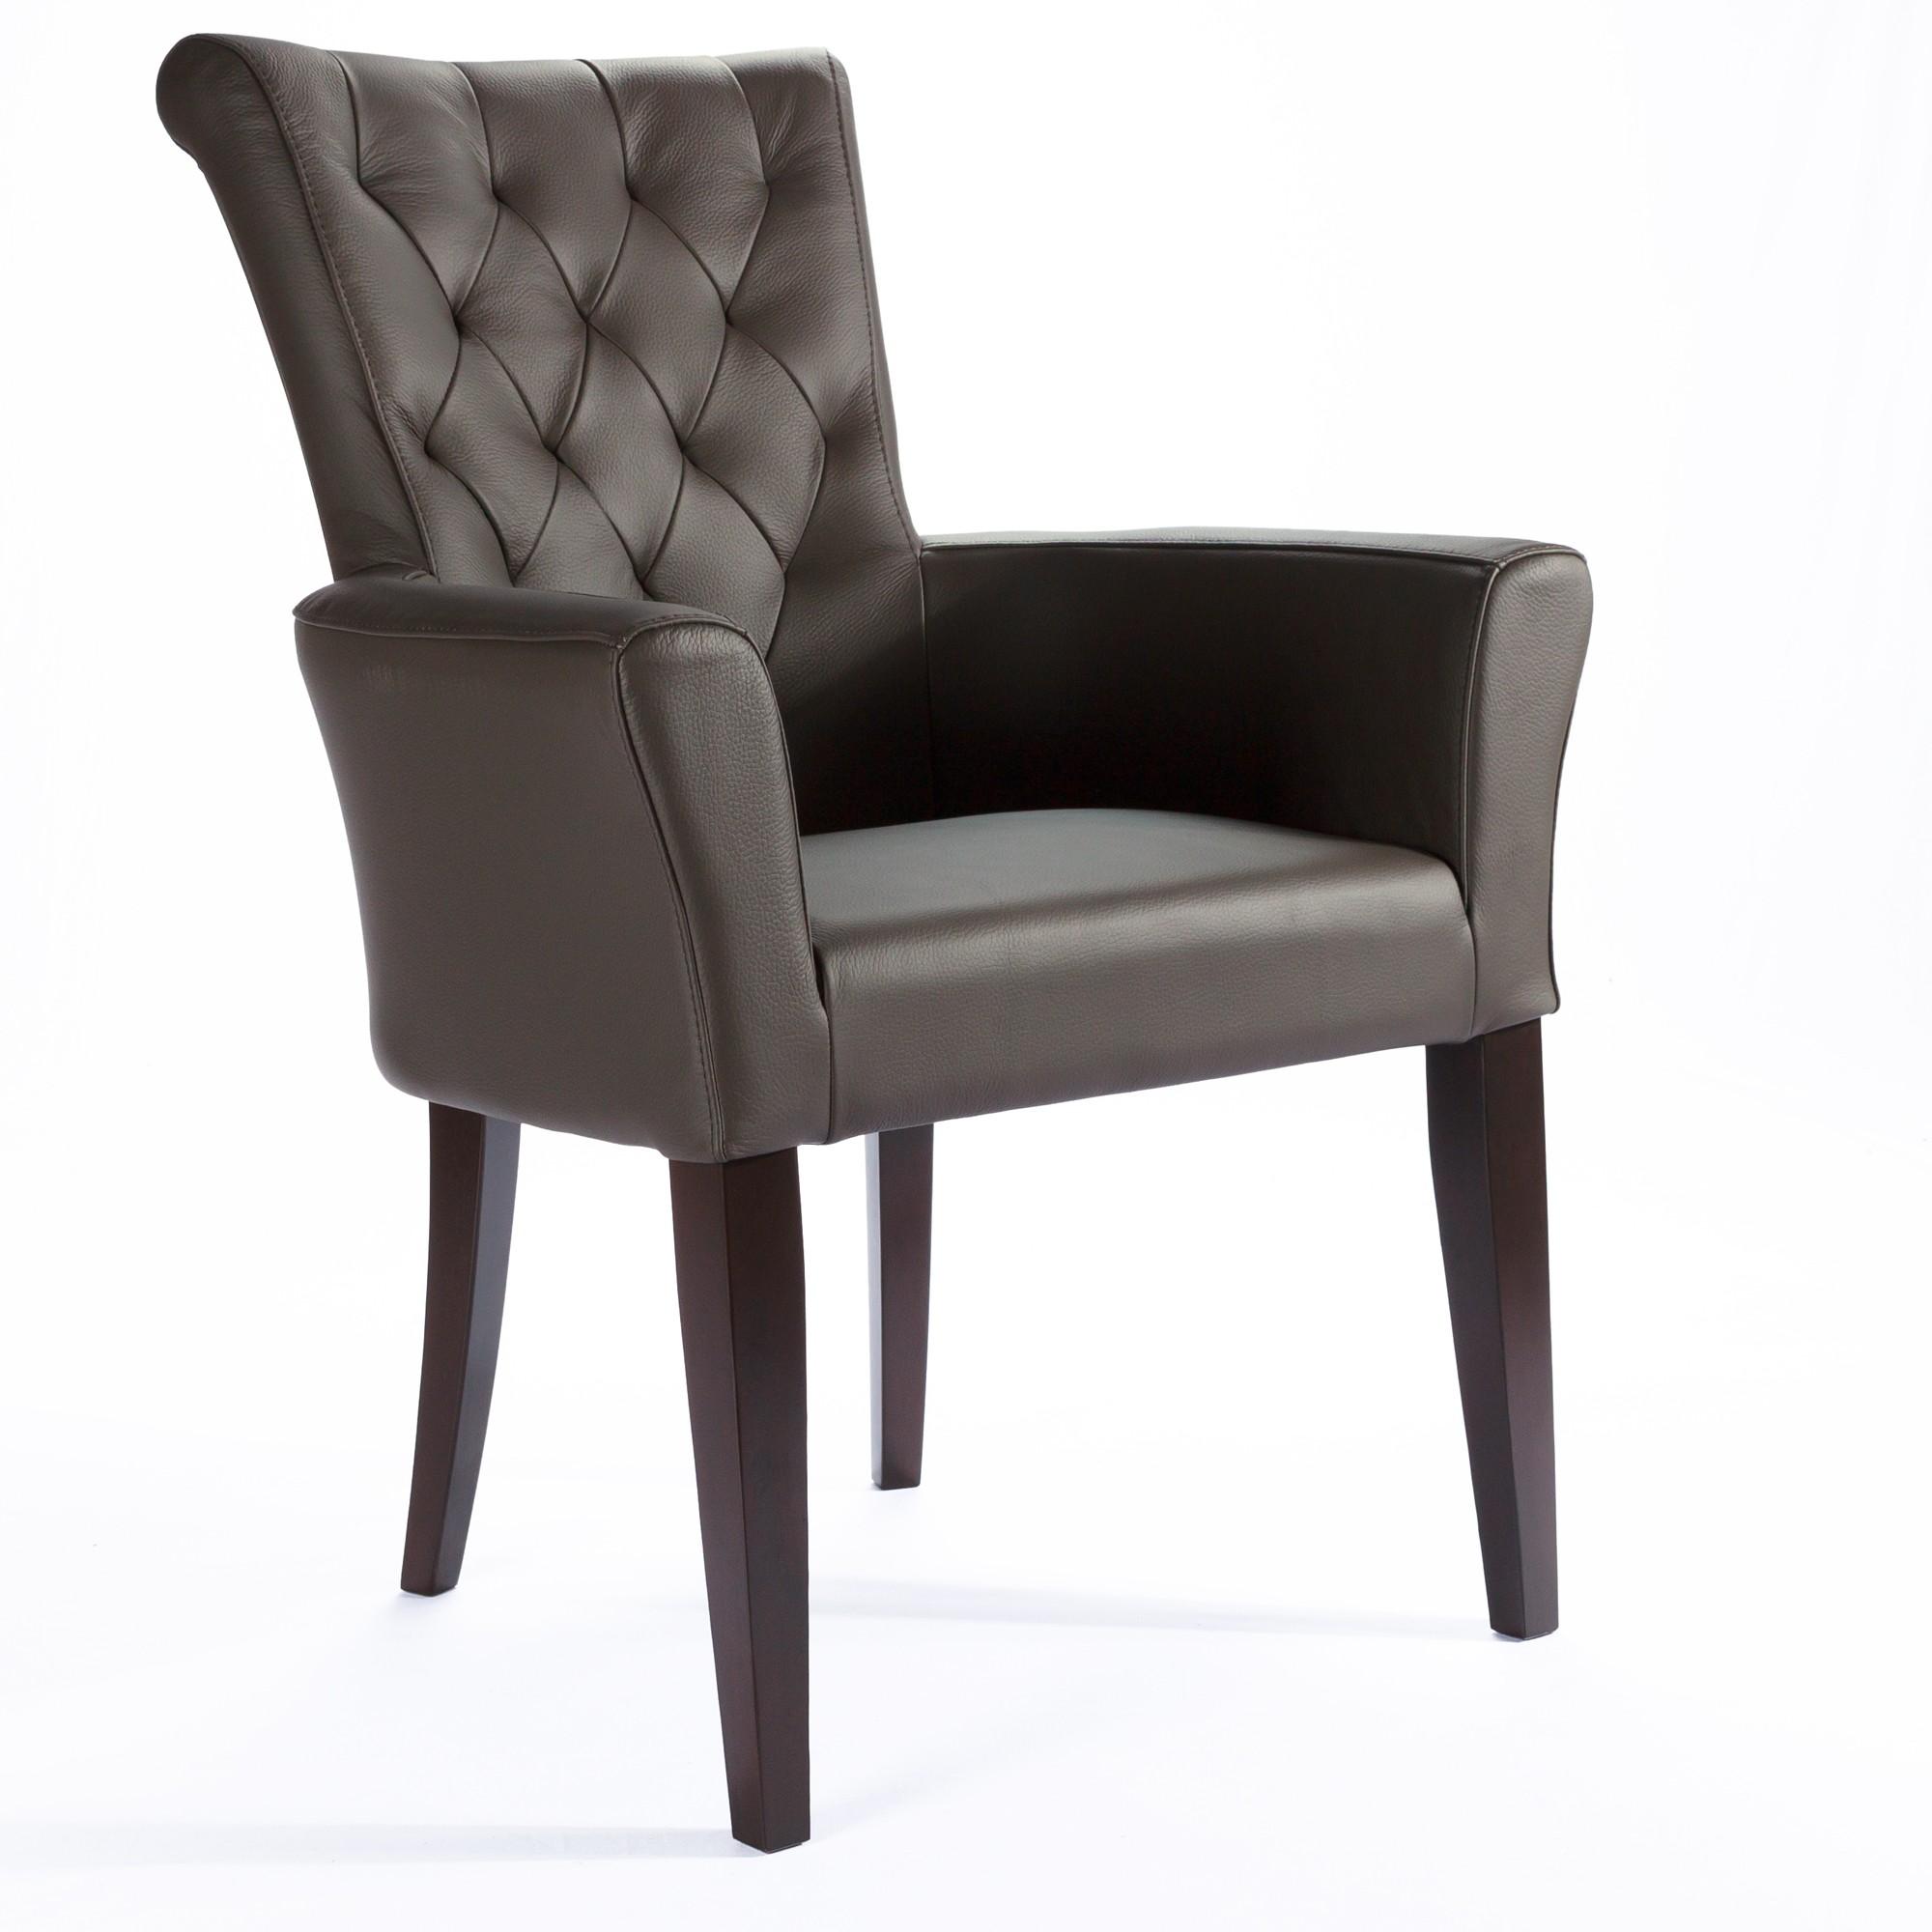 armlehnstuhl ledersessel capo braun. Black Bedroom Furniture Sets. Home Design Ideas